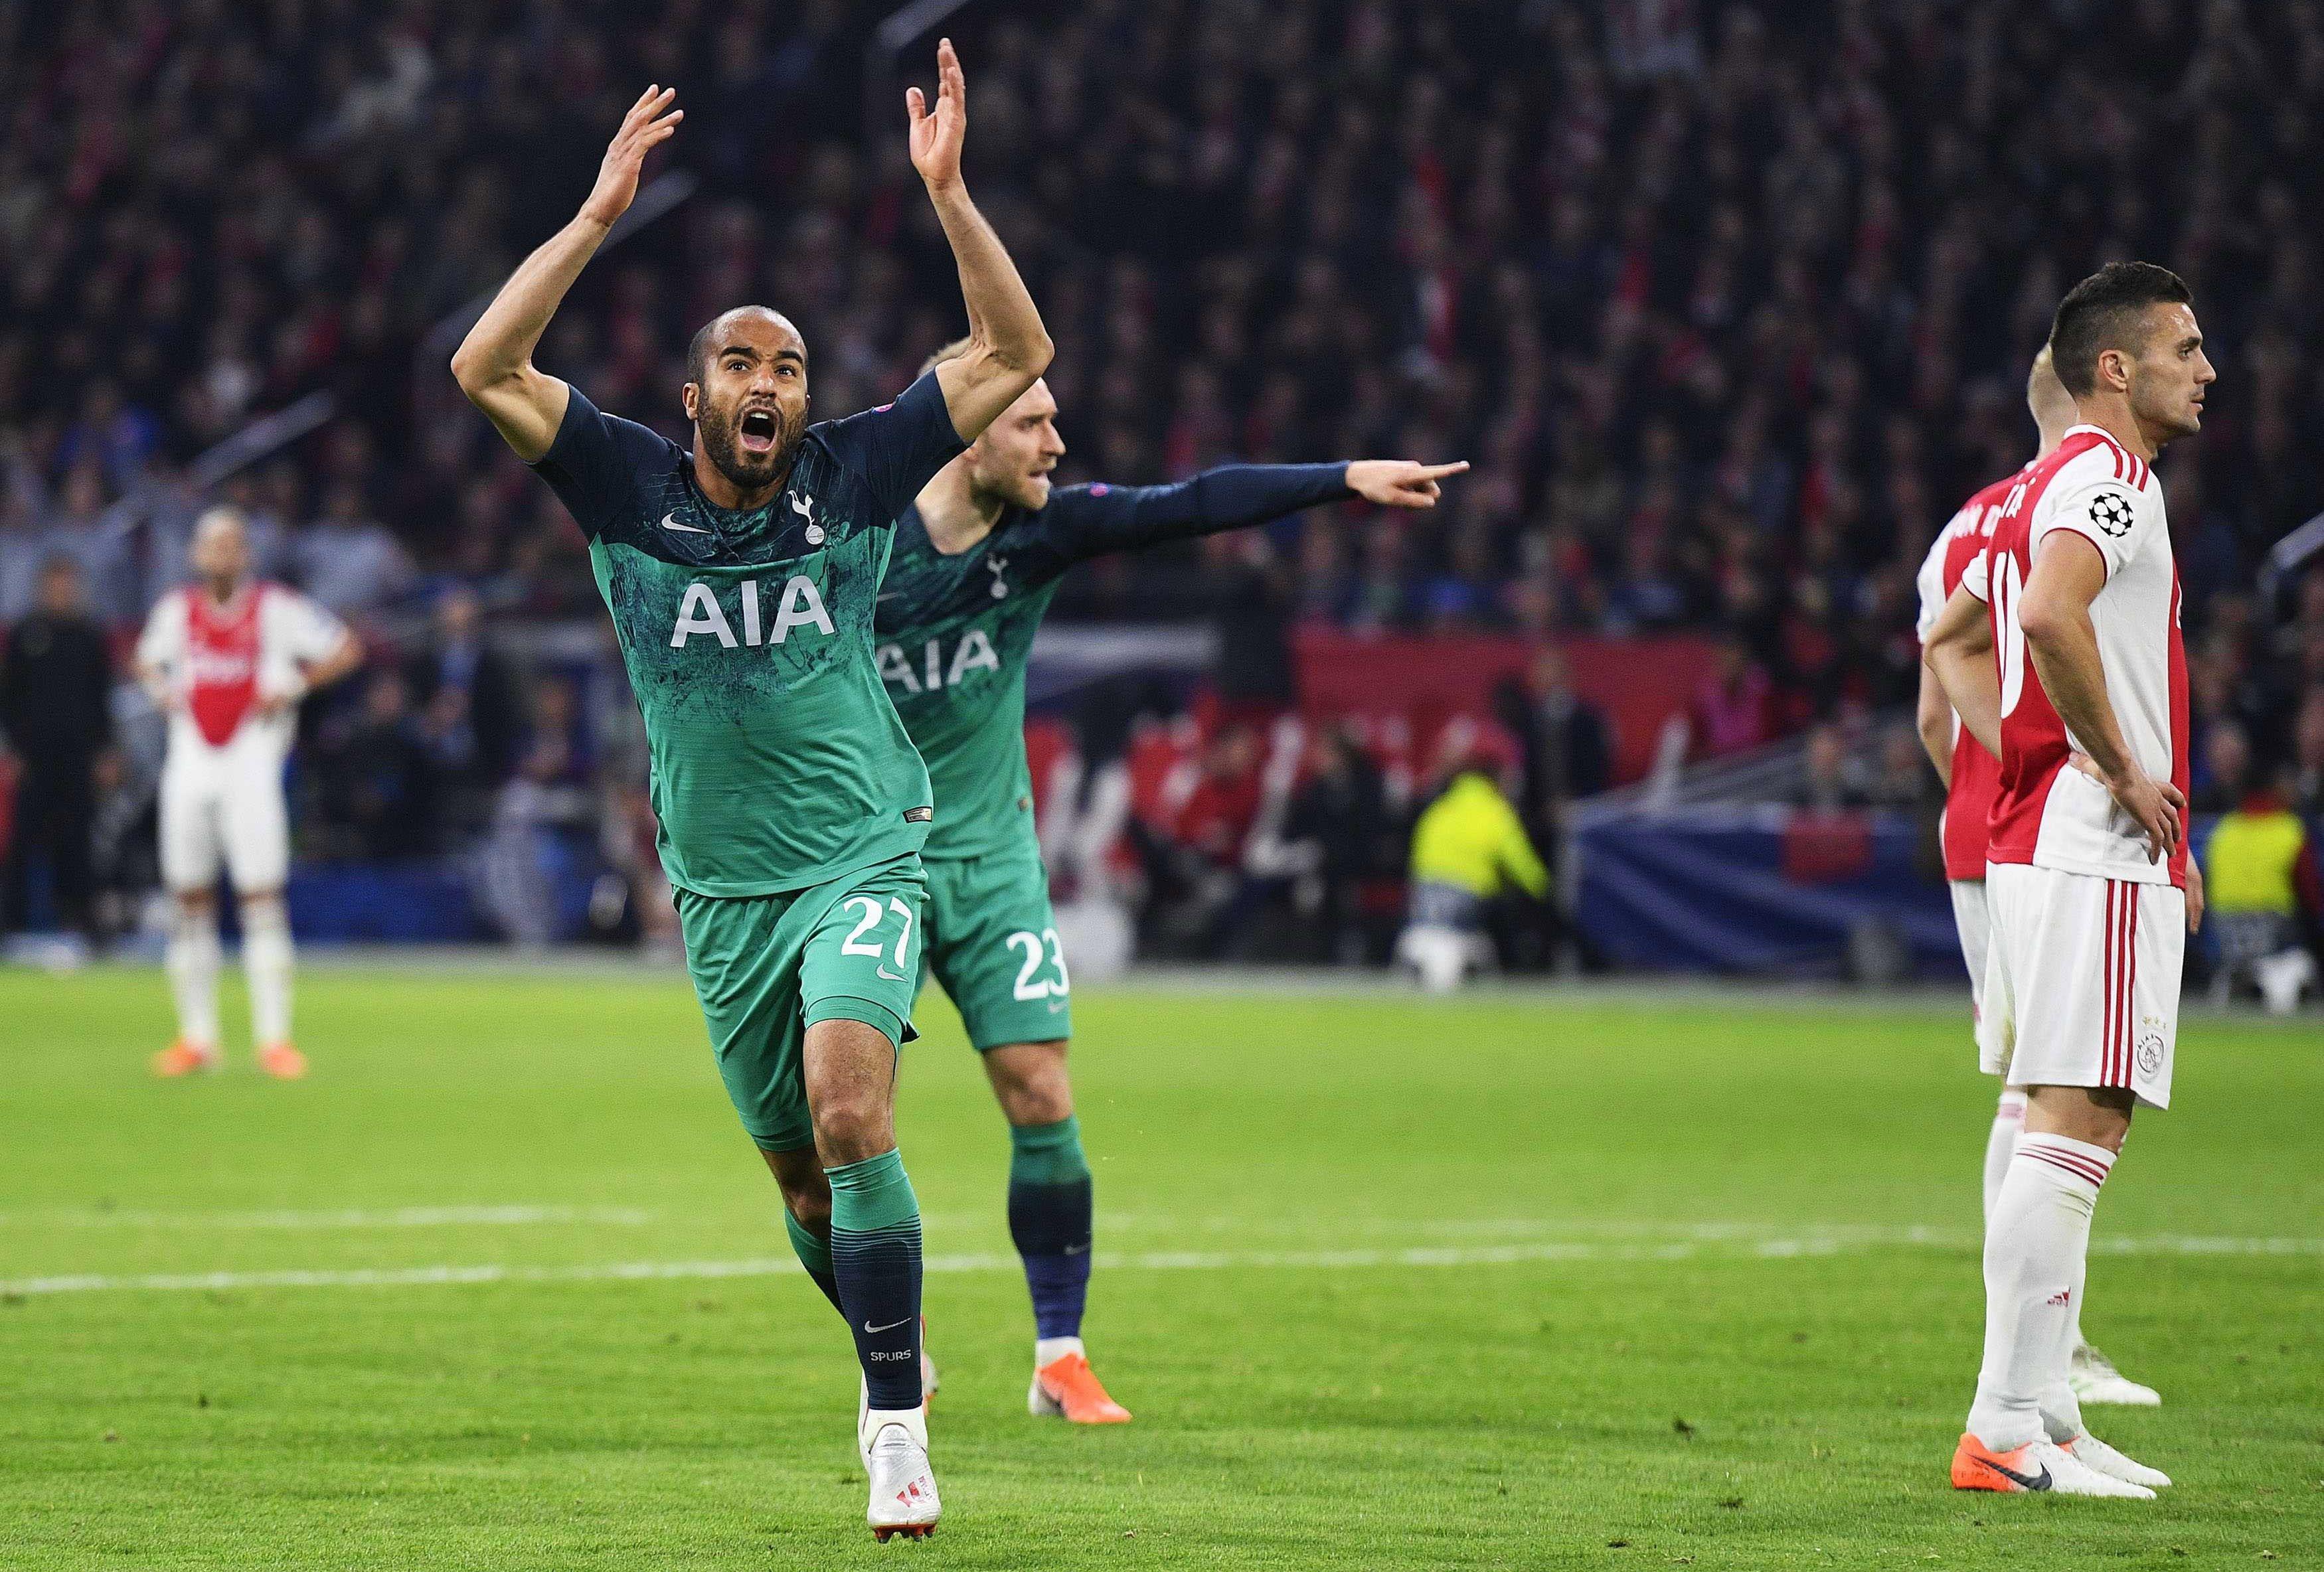 El brasileño Lucas Moura anotó el triplete para clasificar al Tottenham a la final. (Foto Prensa Libre: EFE)